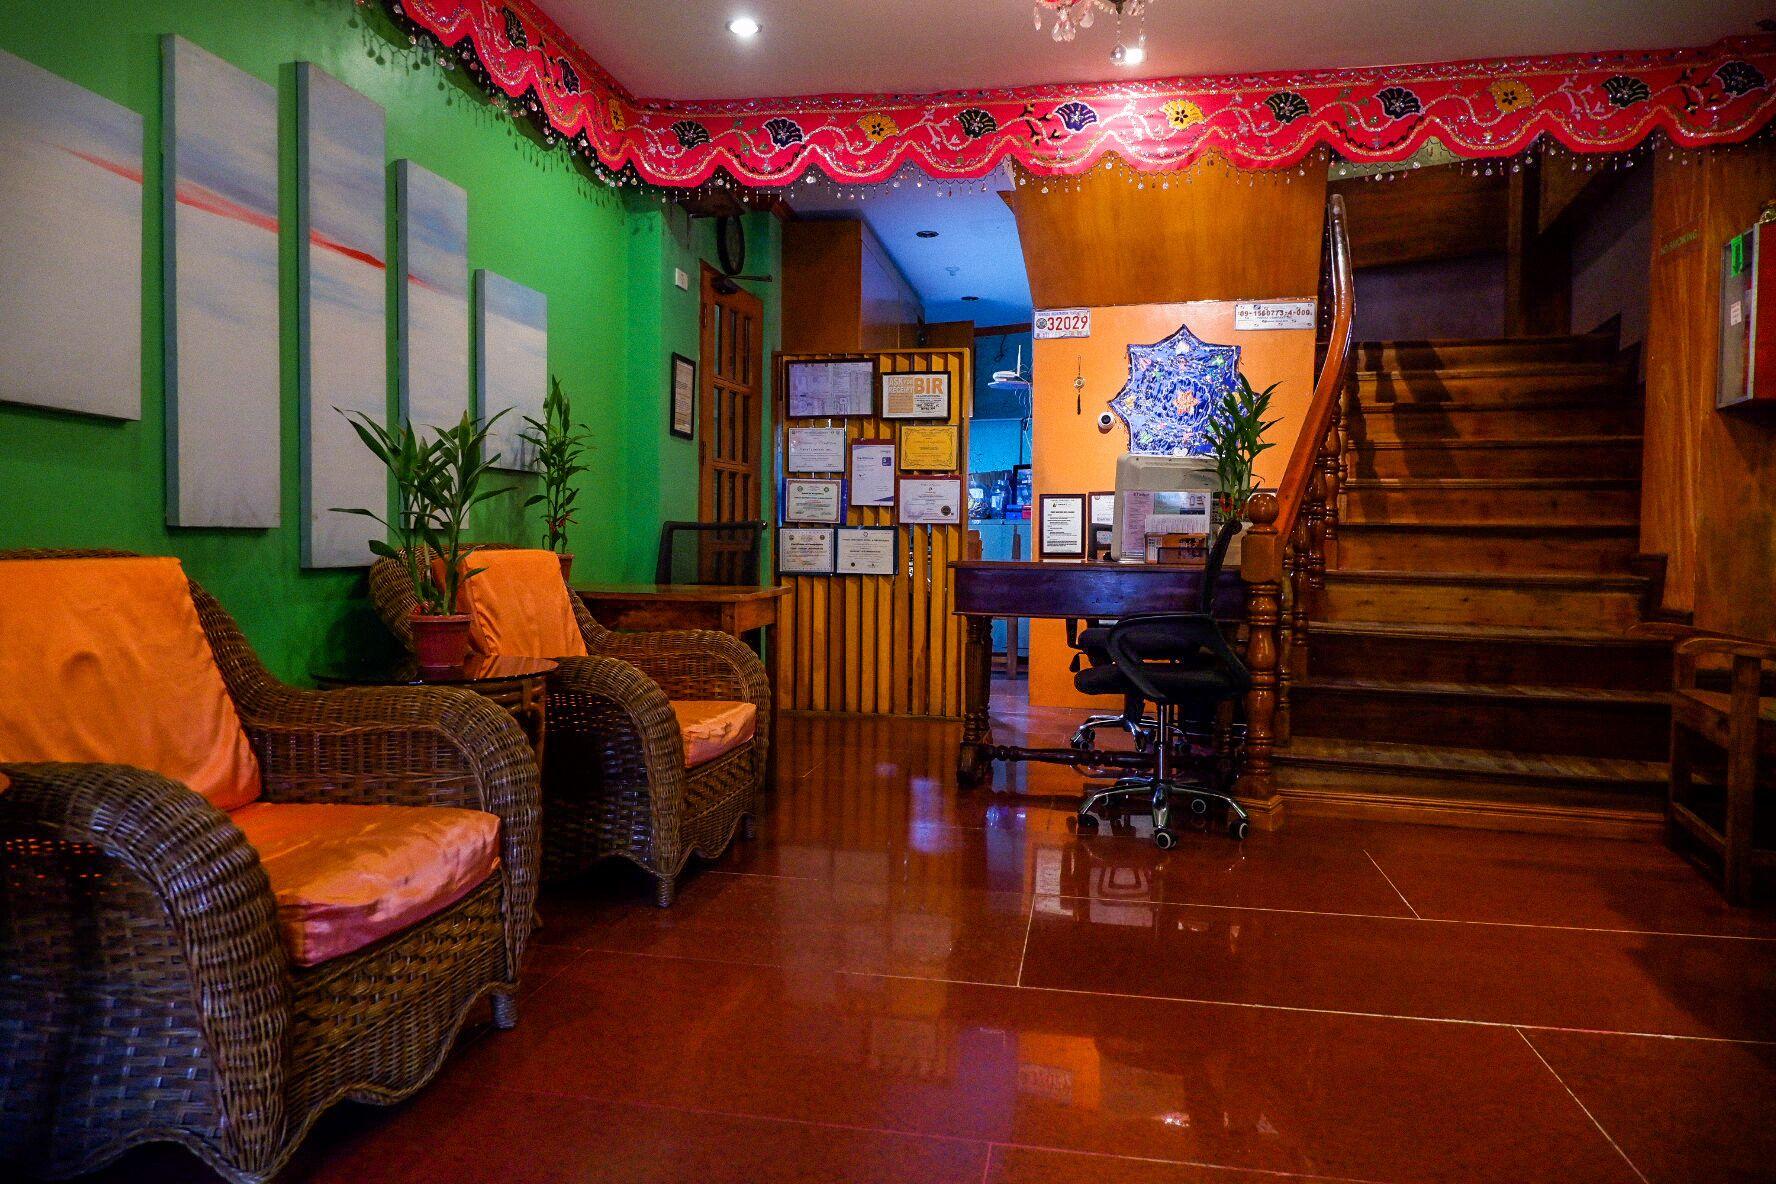 Tinhat Boutique And Restaurant